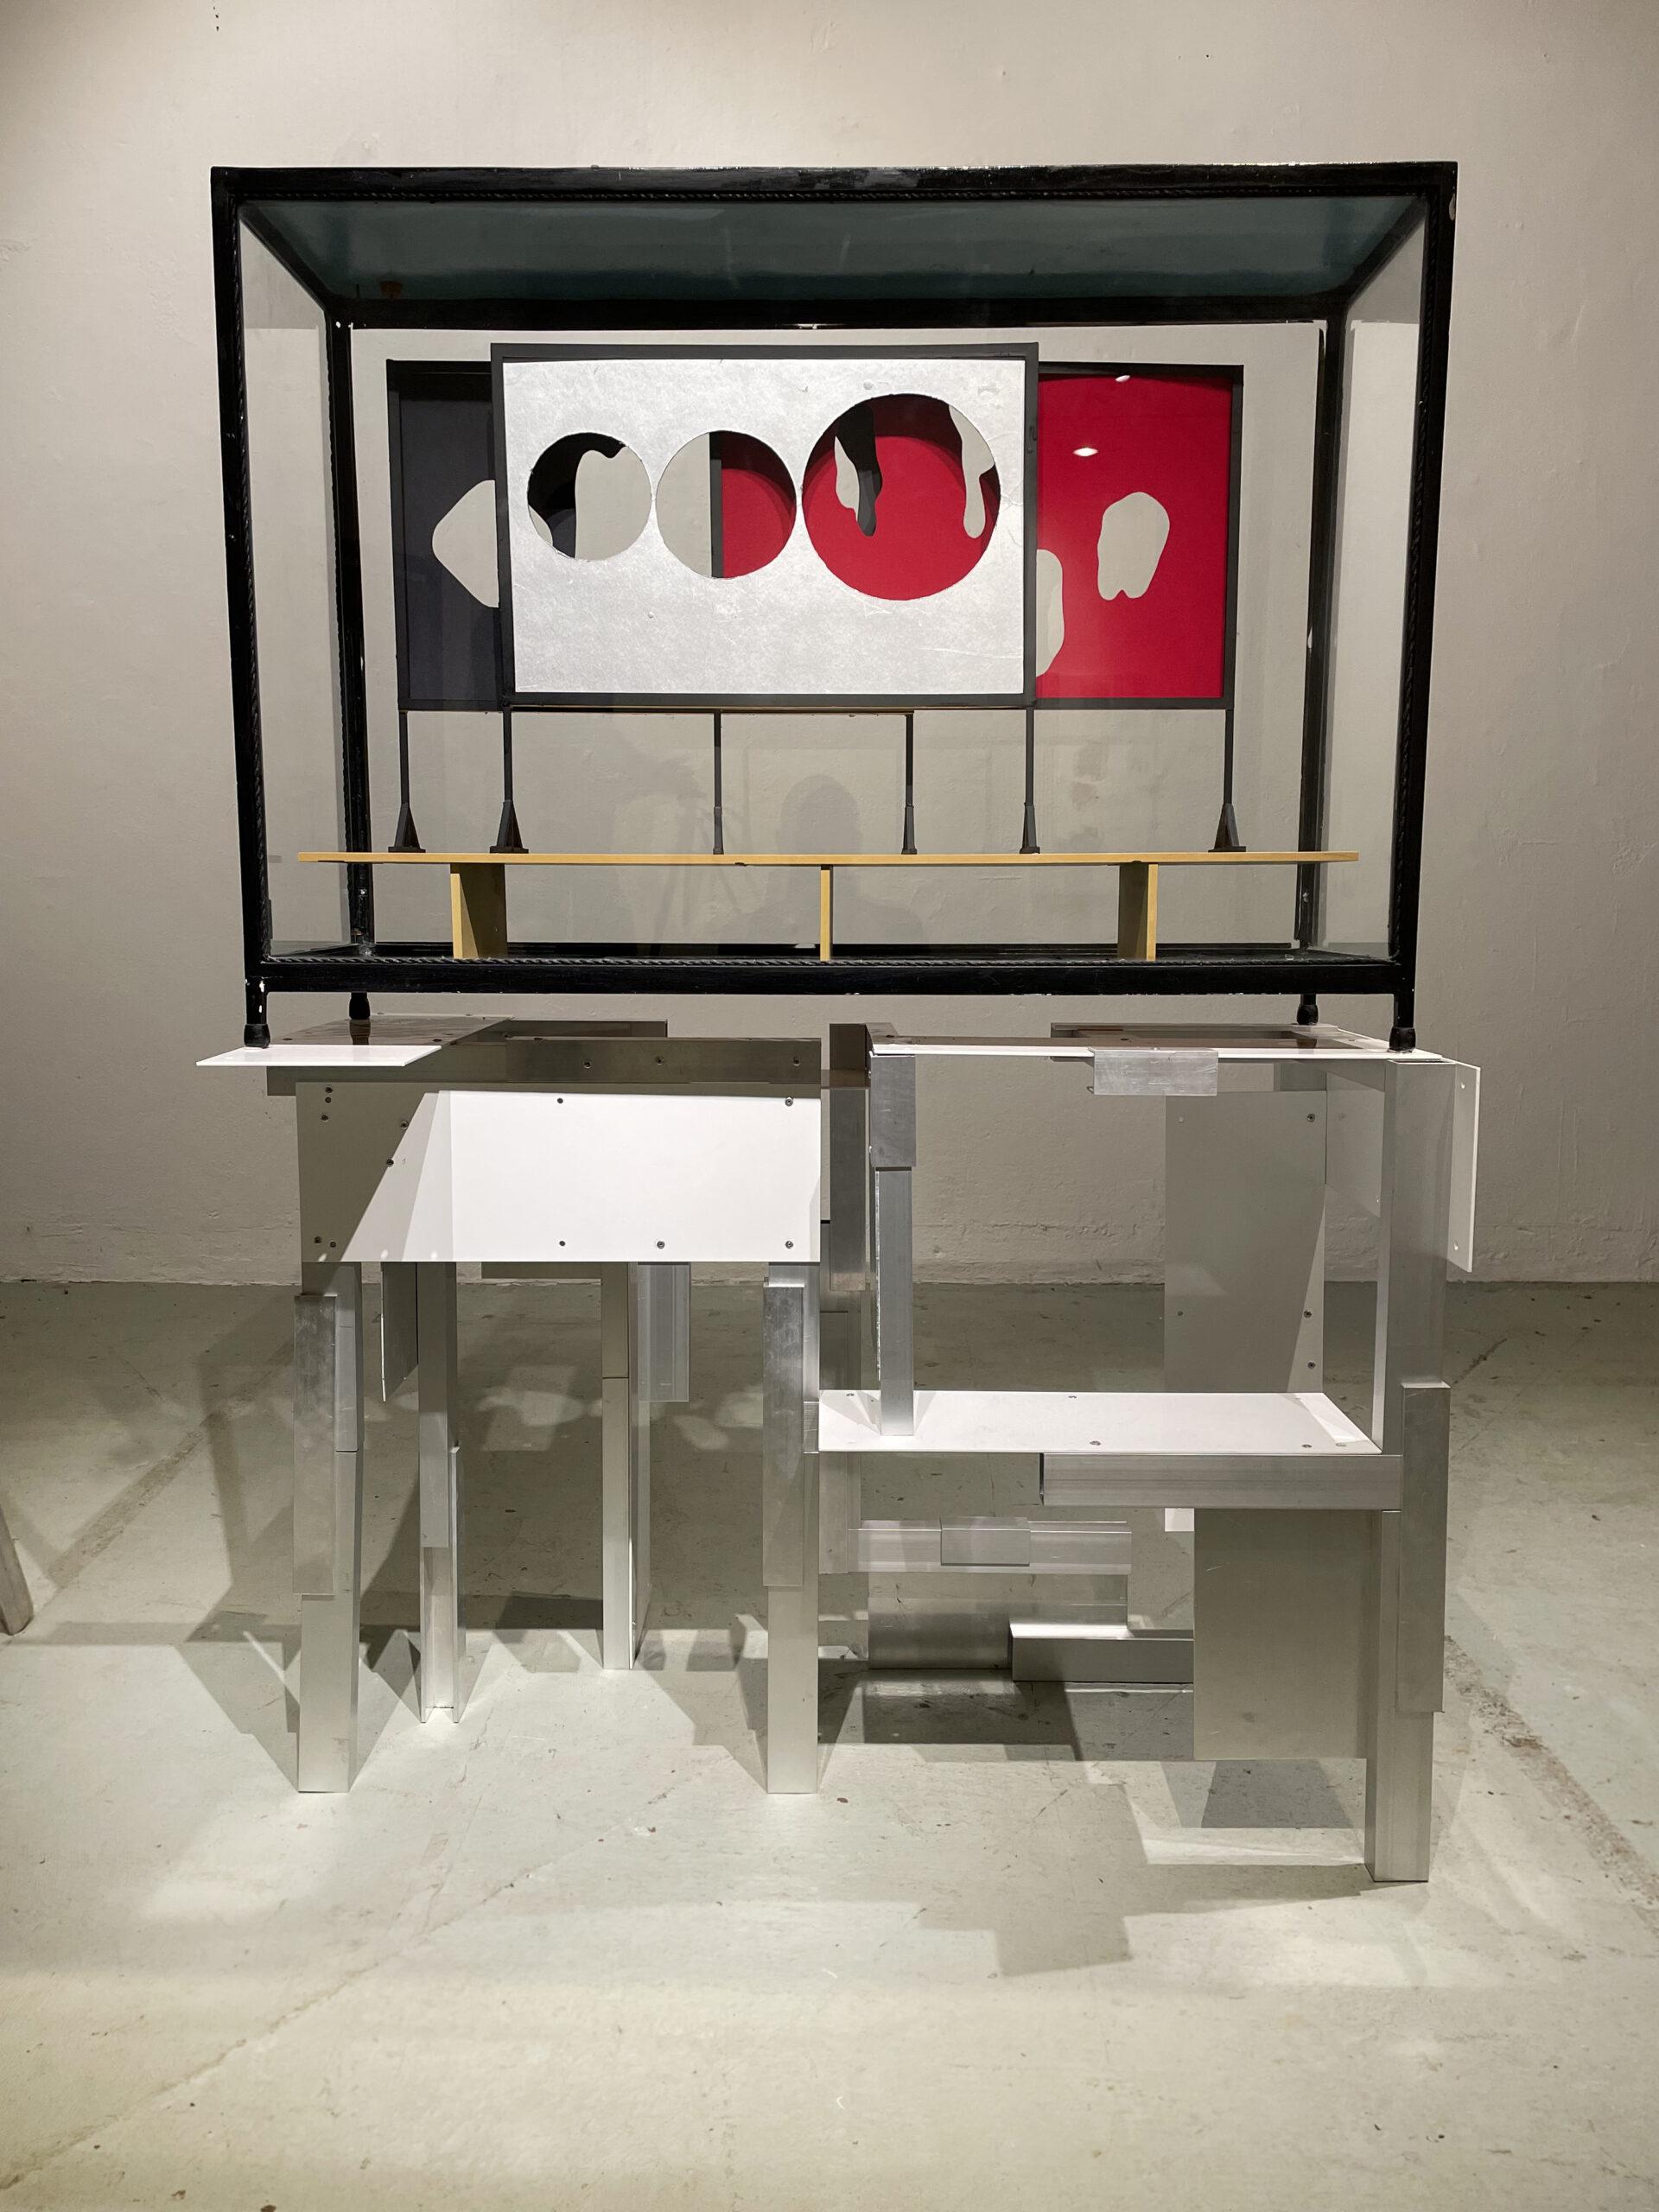 model_for_the_new_museum_krajcik_mckenzie